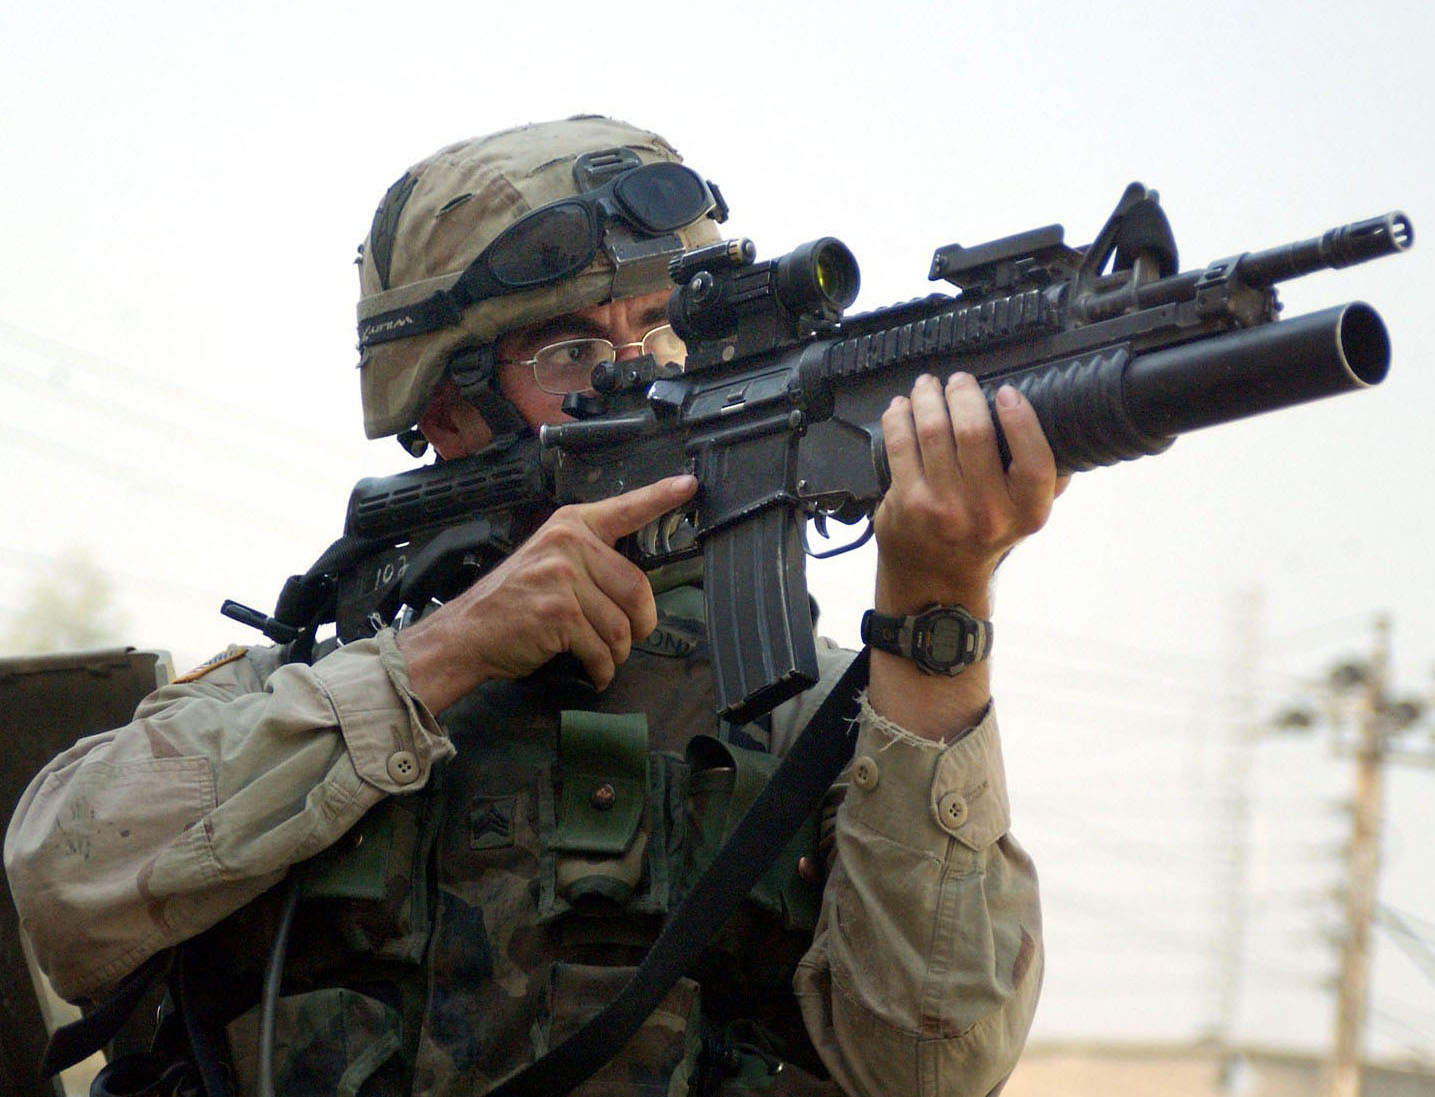 M16 , M4 Carabine y variaciones - Taringa! M16 Acog